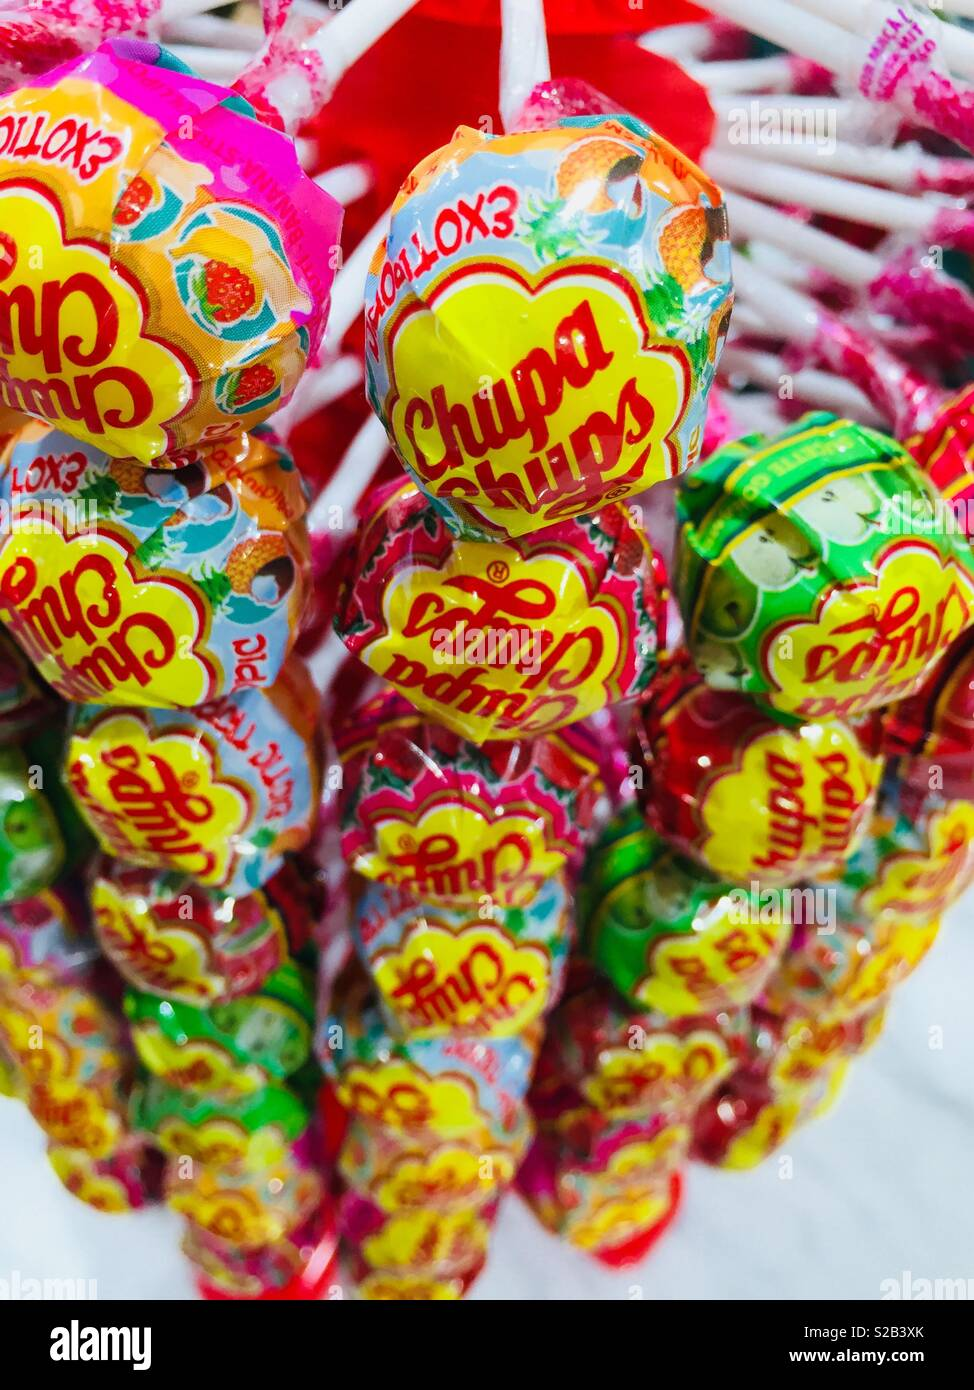 Candy Sauger für Verkauf, USA Stockbild